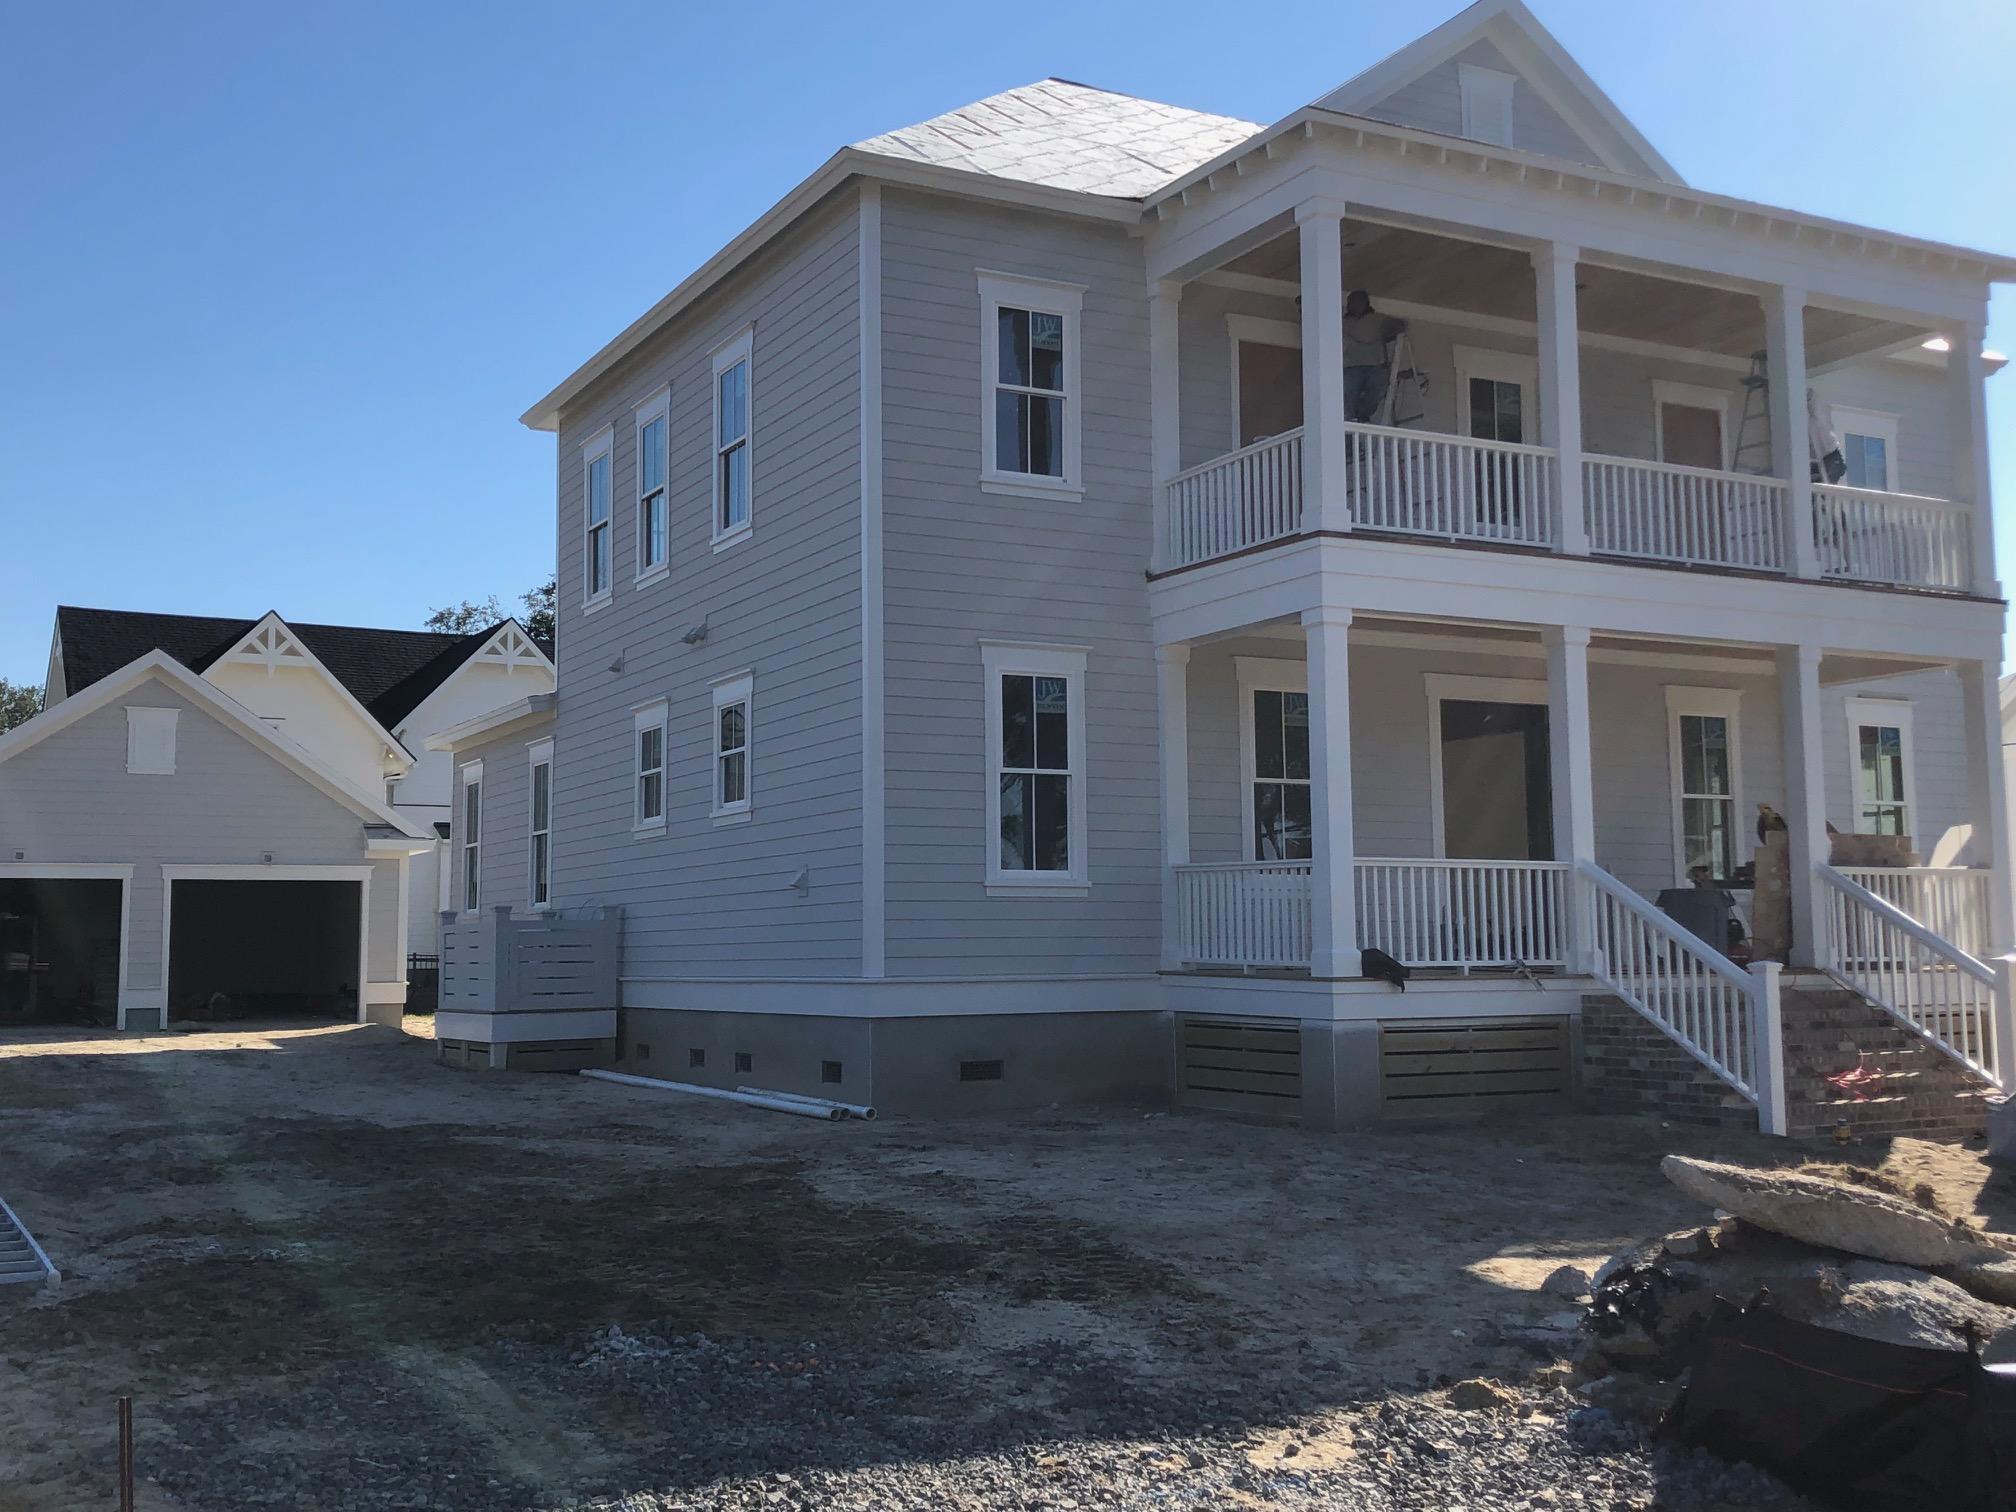 Daniel Island Homes For Sale - 532 Lesesne, Charleston, SC - 4